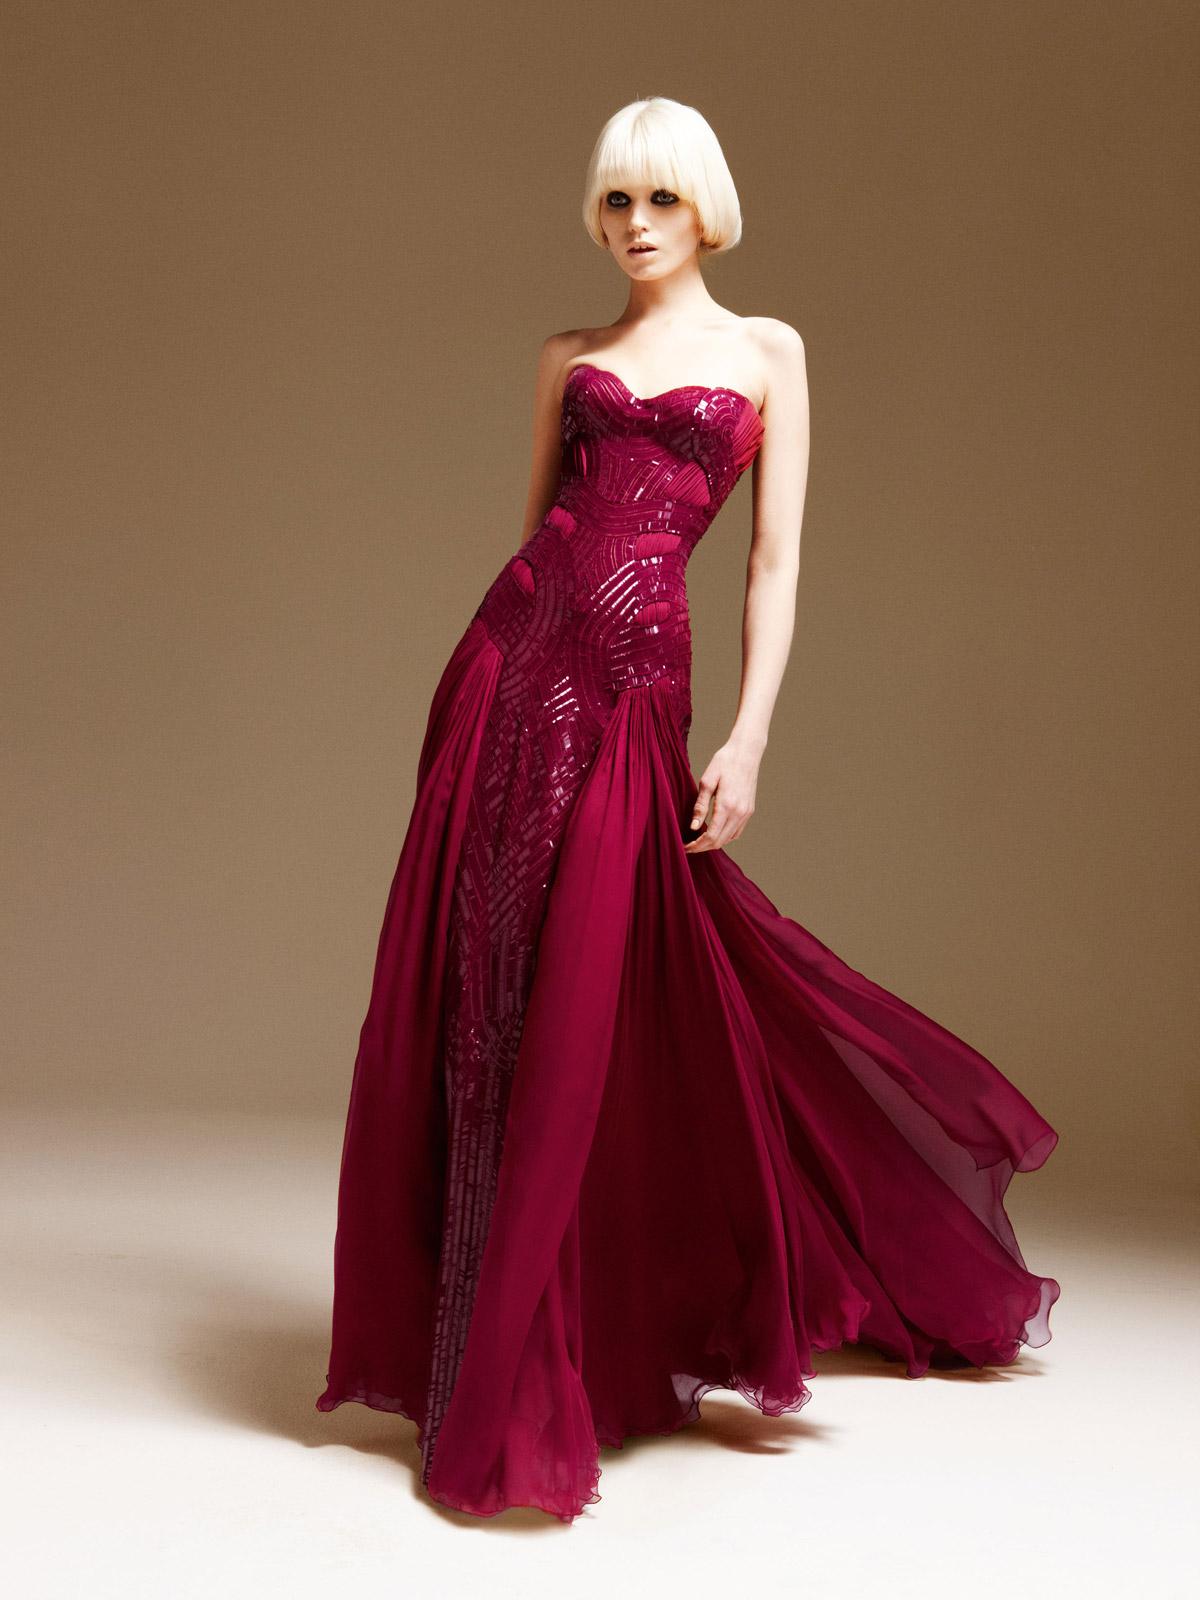 Maksim blog: Versace dresses gowns